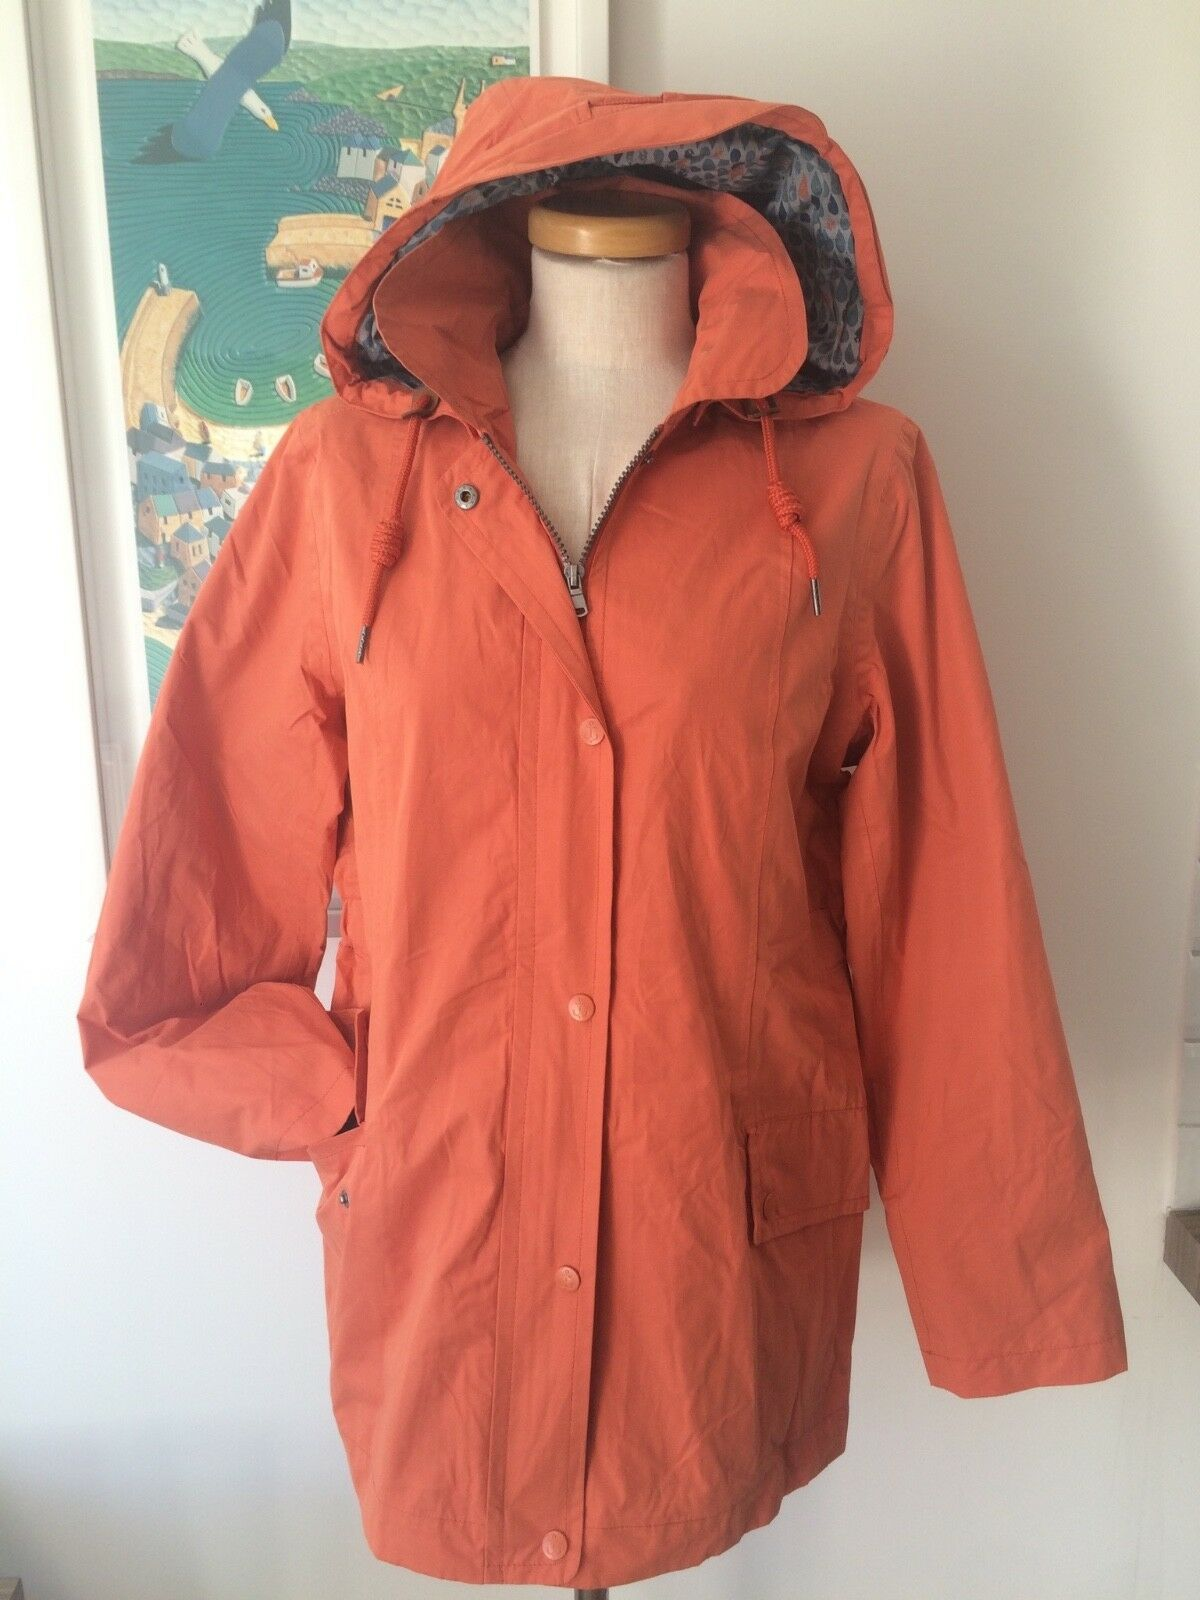 Seasalt Fairweather Veste-Flamme Orange-UK10 EU38-Vente échantillon sauver